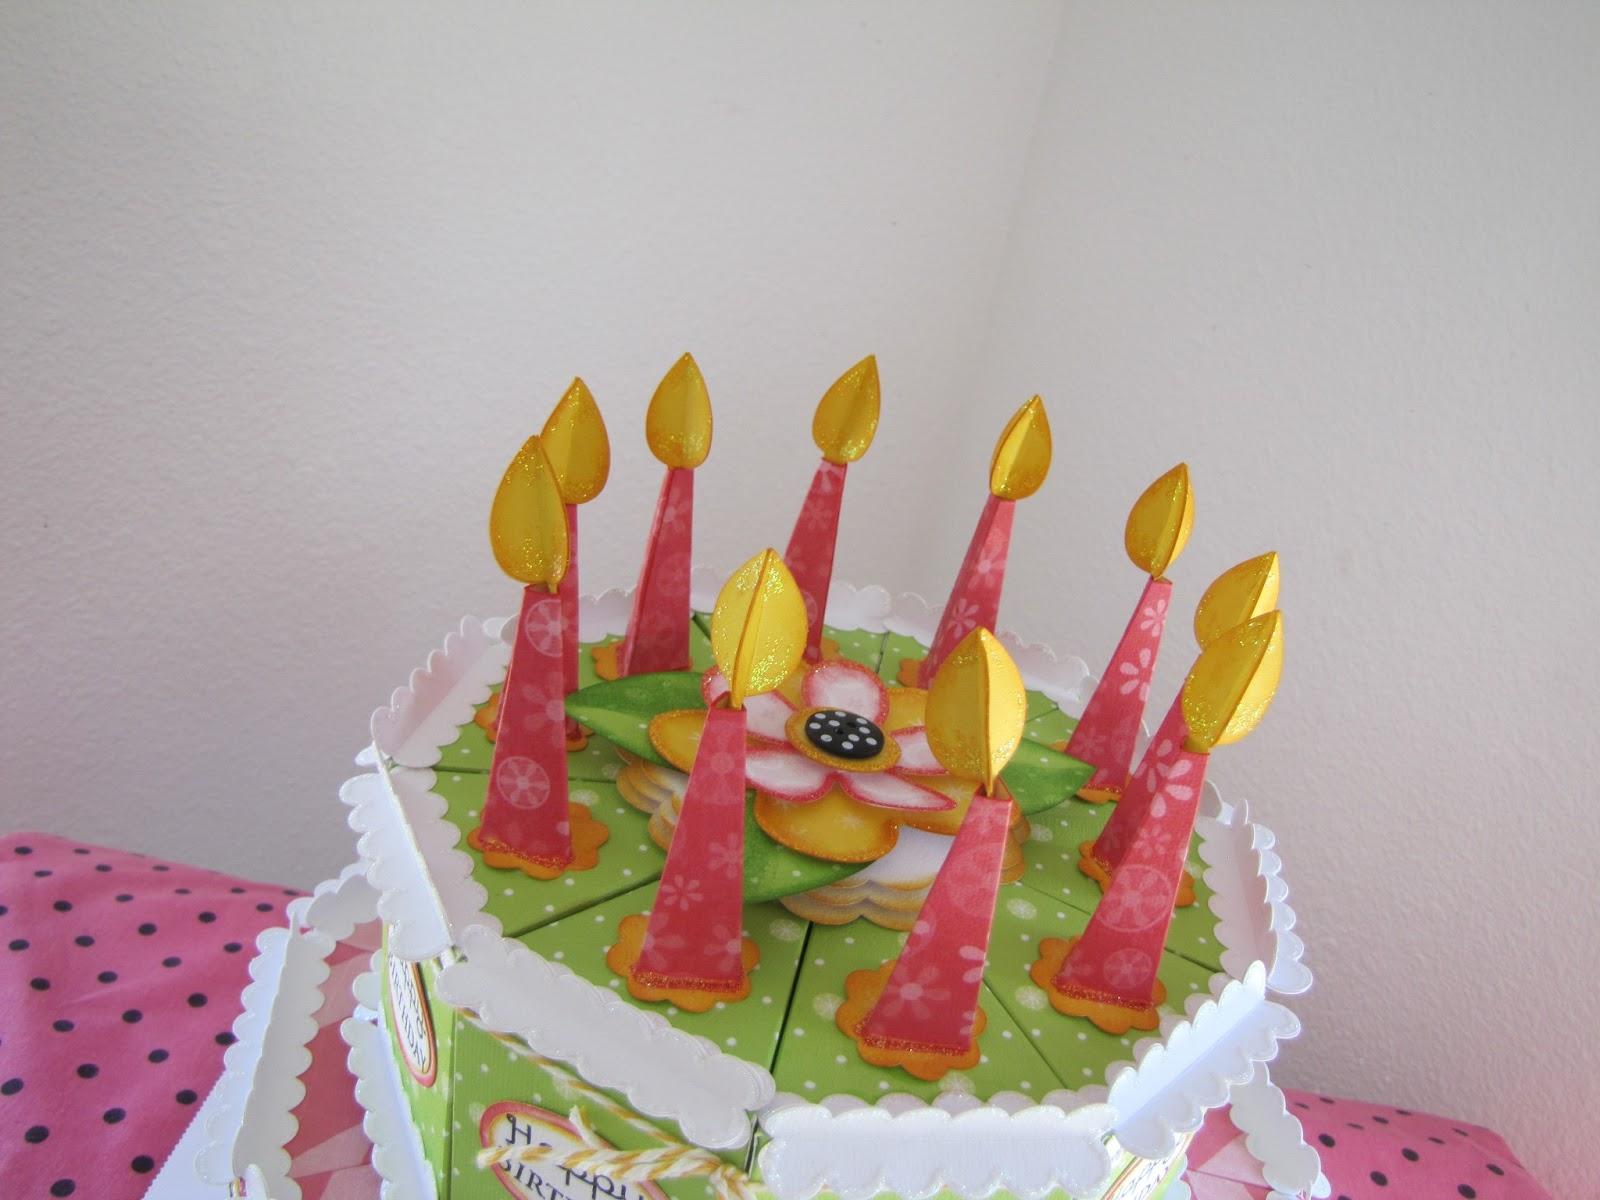 Свечи на торте из бумаги